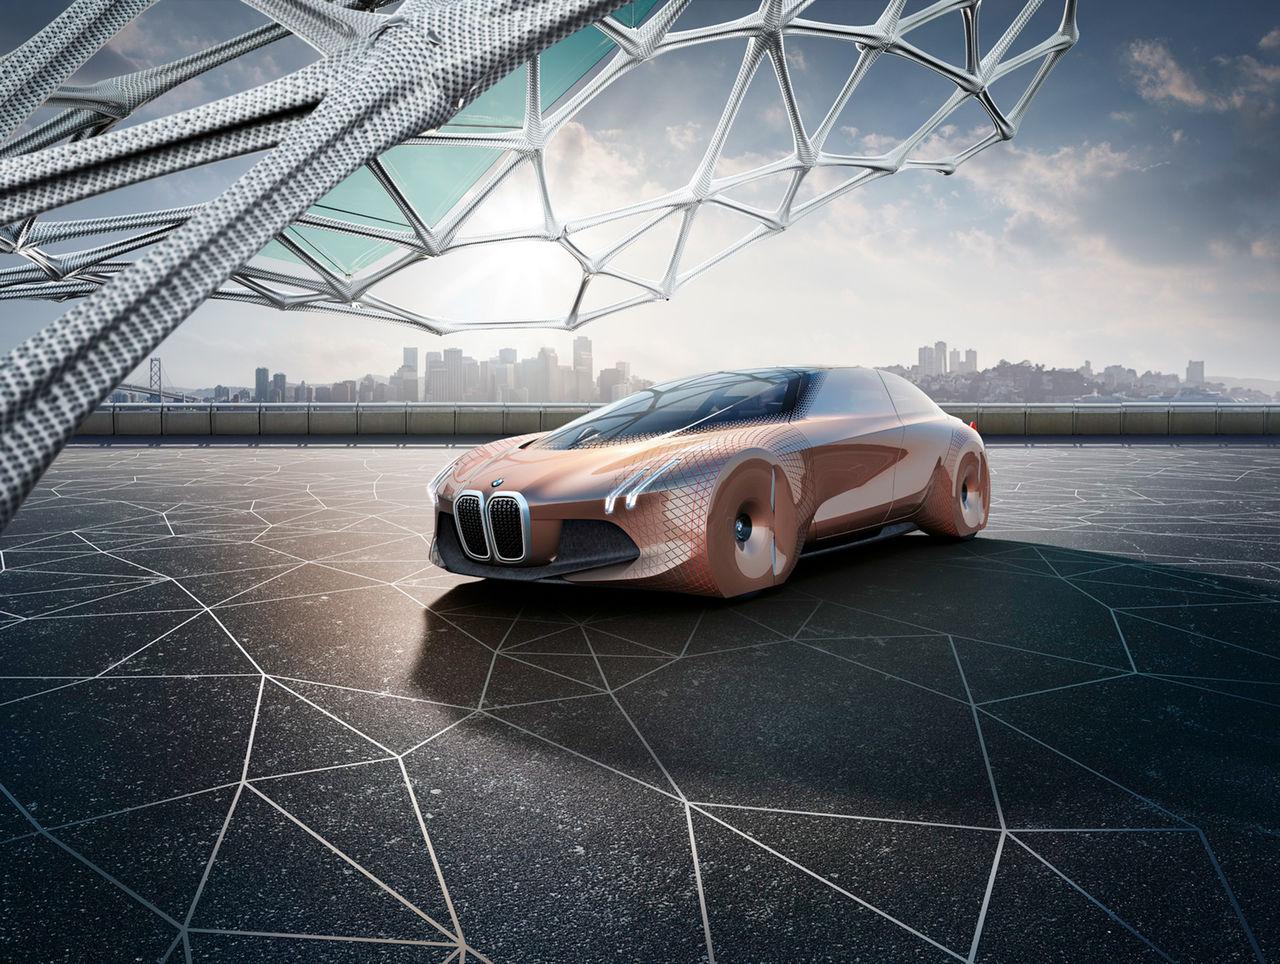 BMW firar 100 år med konceptbilen Vision Next 100